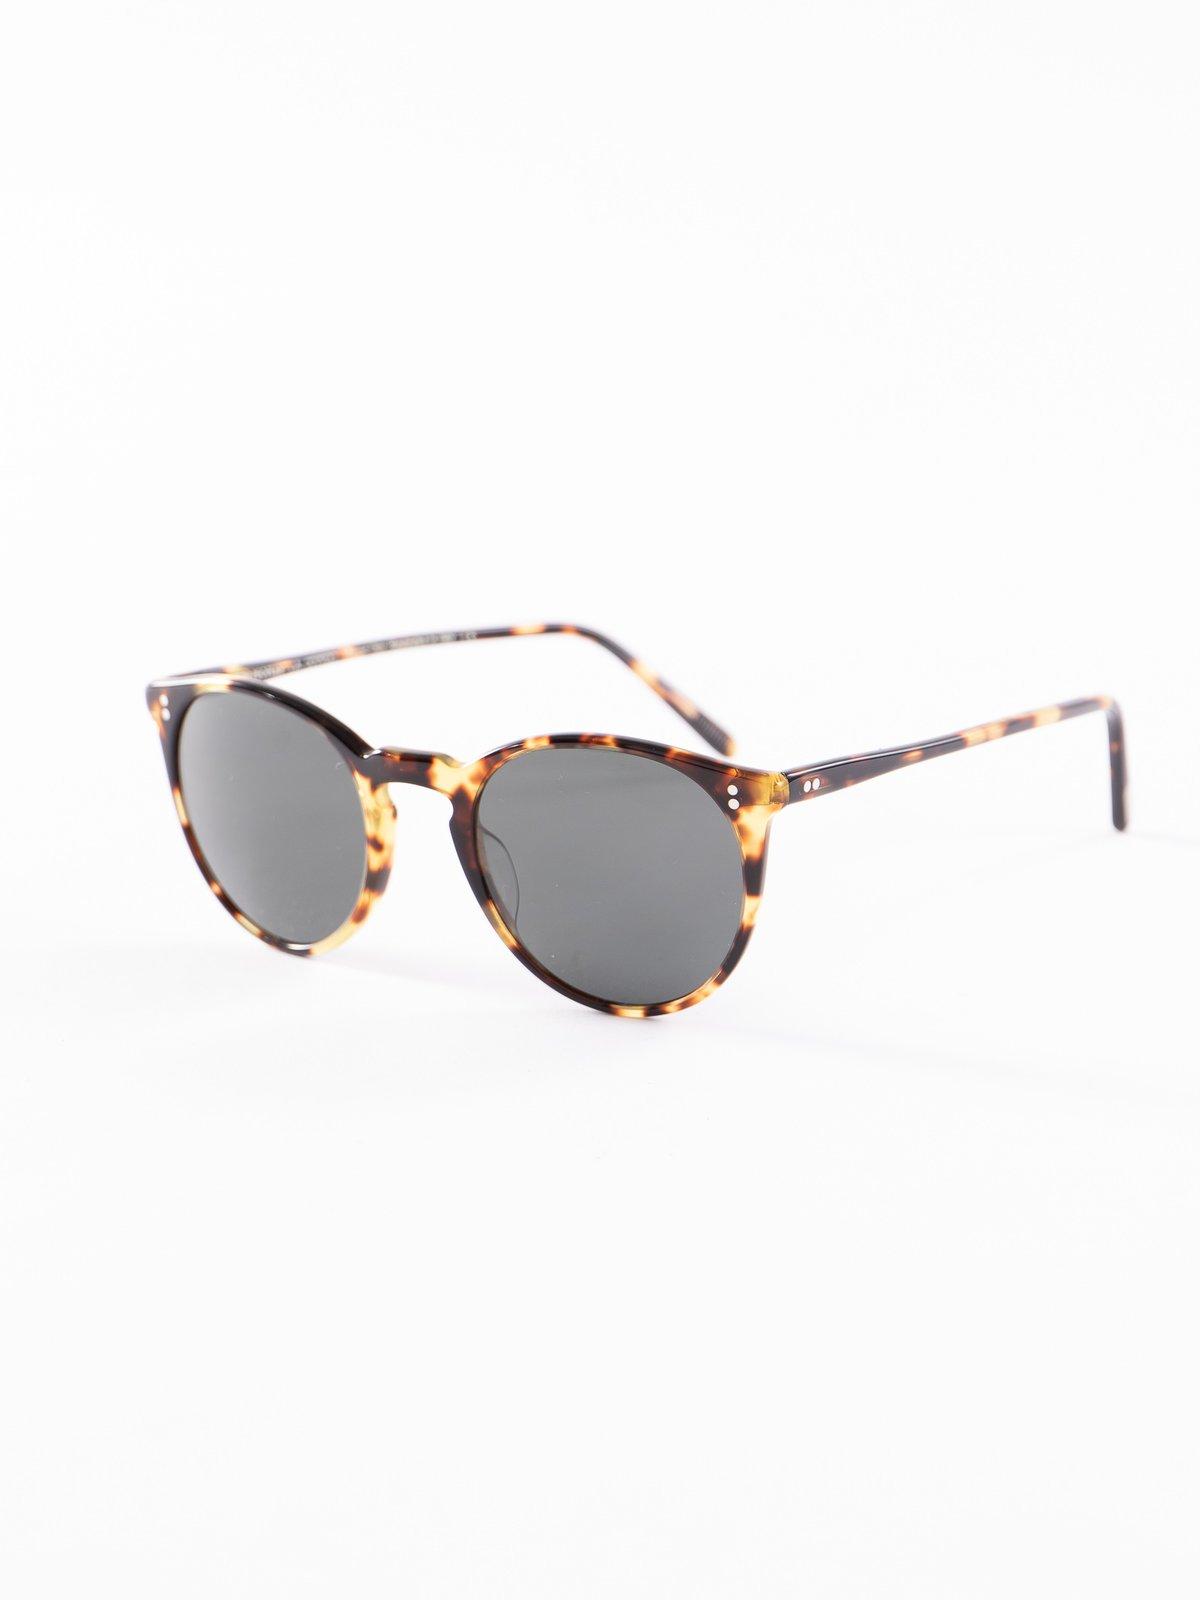 Vintage DTB/Dark Grey Polar O'Malley Sunglasses - Image 2